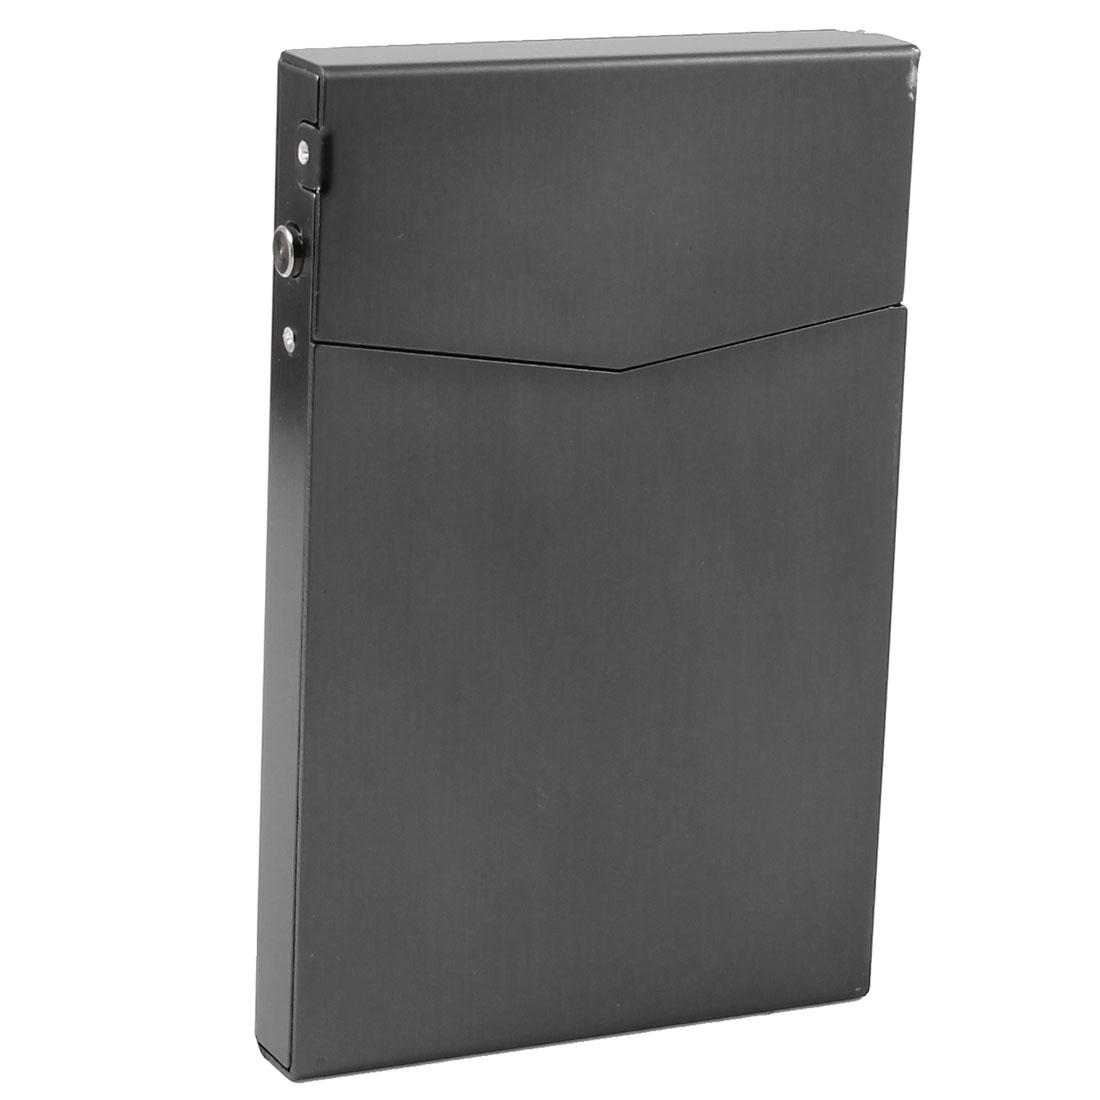 Magnetic Closure Silver Gray Aluminum 90mmx60mmx10mm Full Pack 7 Pcs Cigarette Case Box Holder